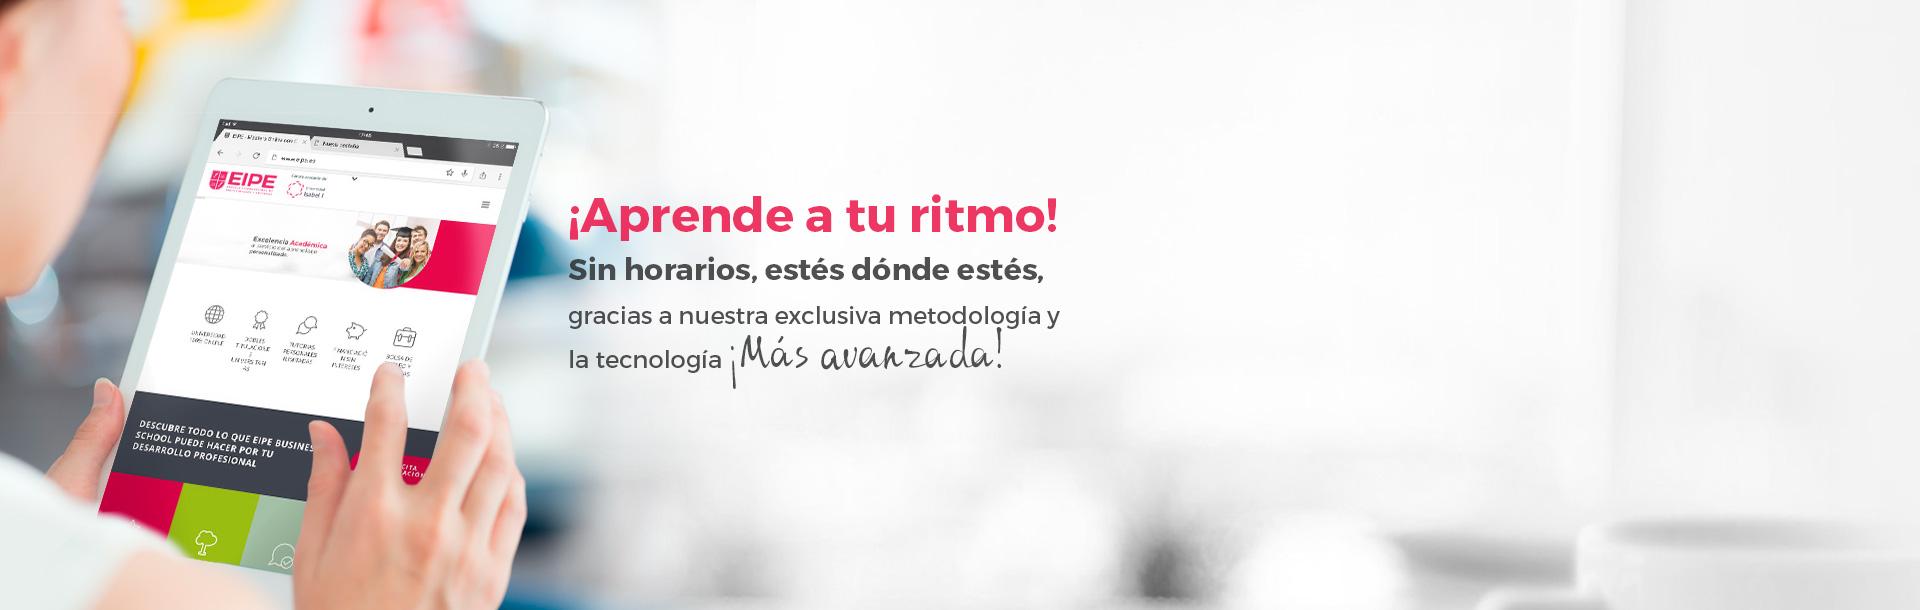 slider-eipe-formacion-universitaria-master-madrid-online